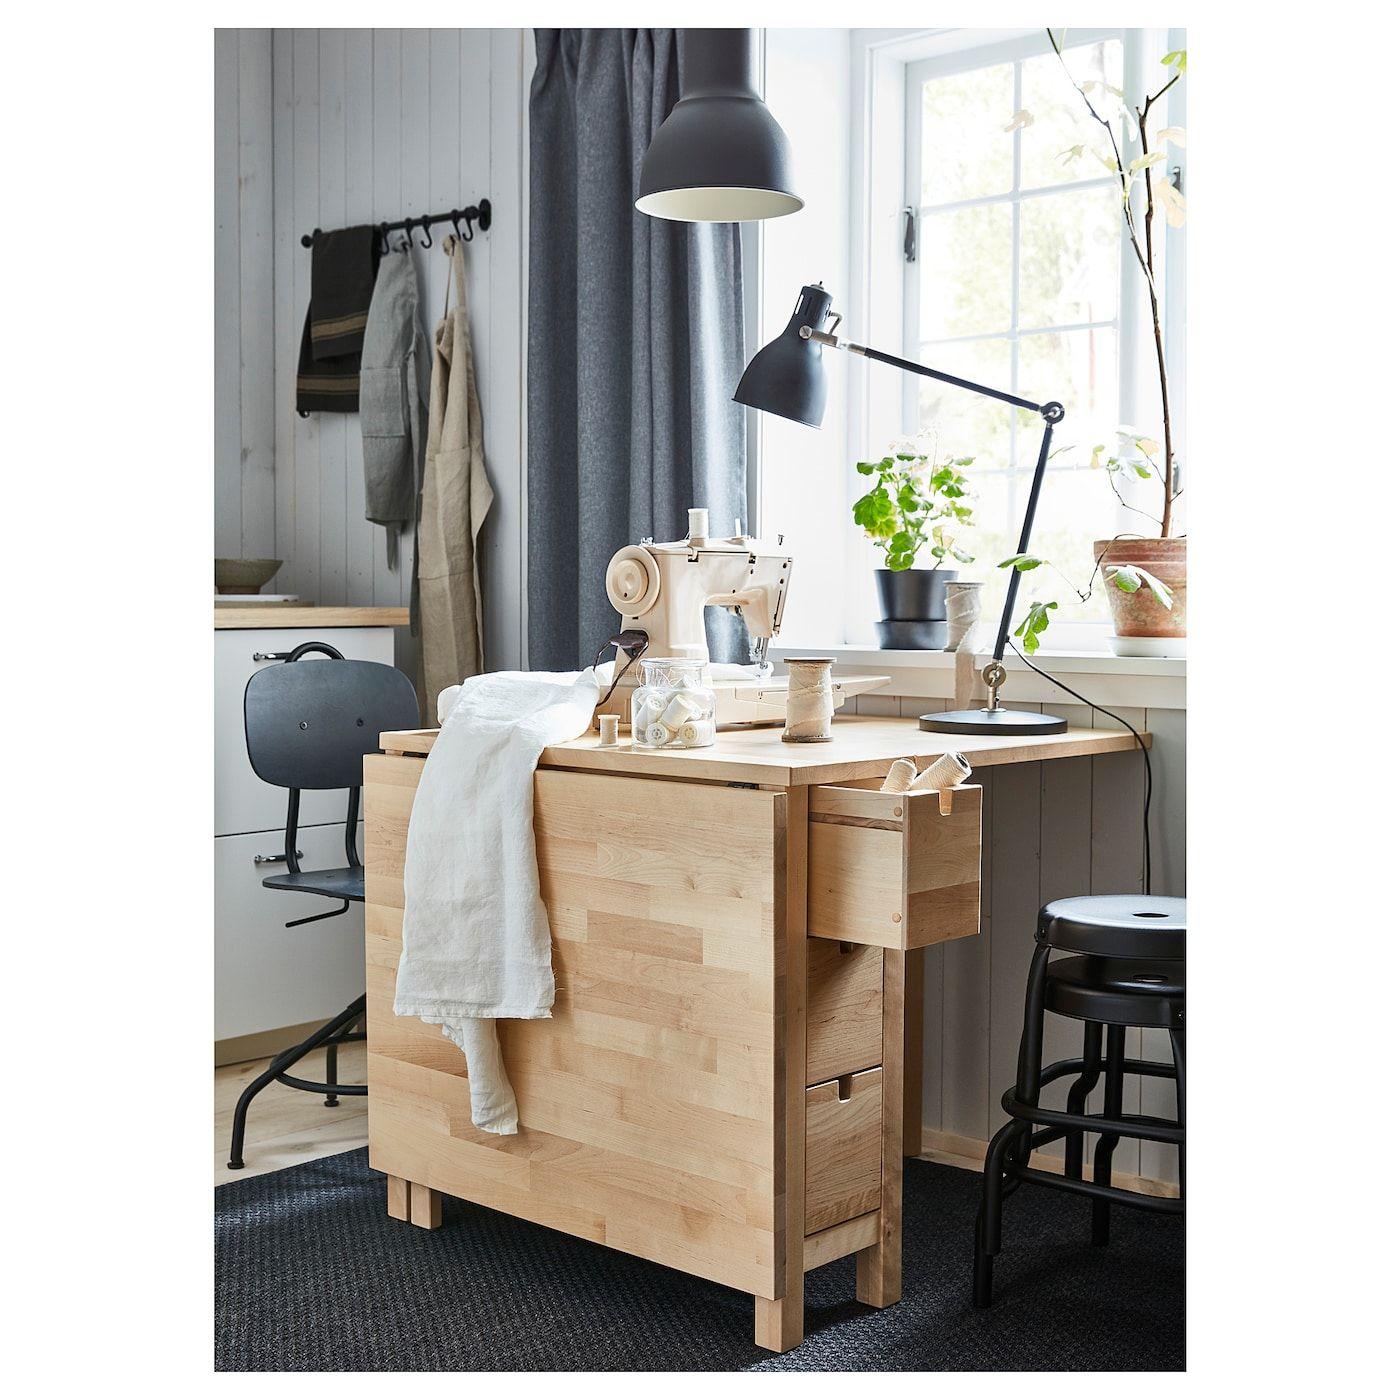 Norden Gateleg Table Birch Ikea Norden Gateleg Table Ikea Small Spaces Sewing Room Inspiration